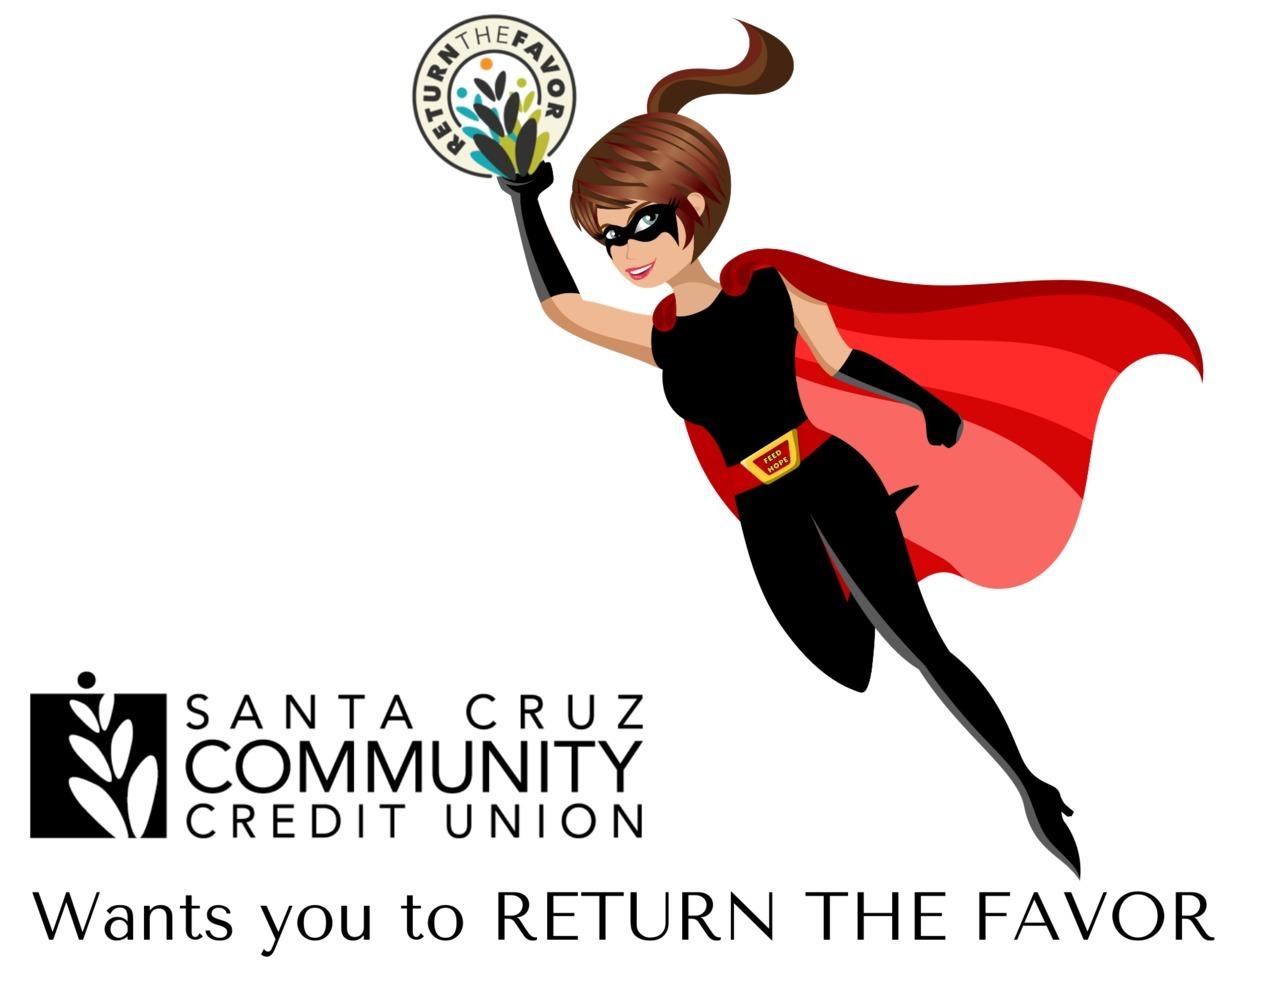 Santa Cruz Community Credit Union Wants You to RETURN THE FAVOR!